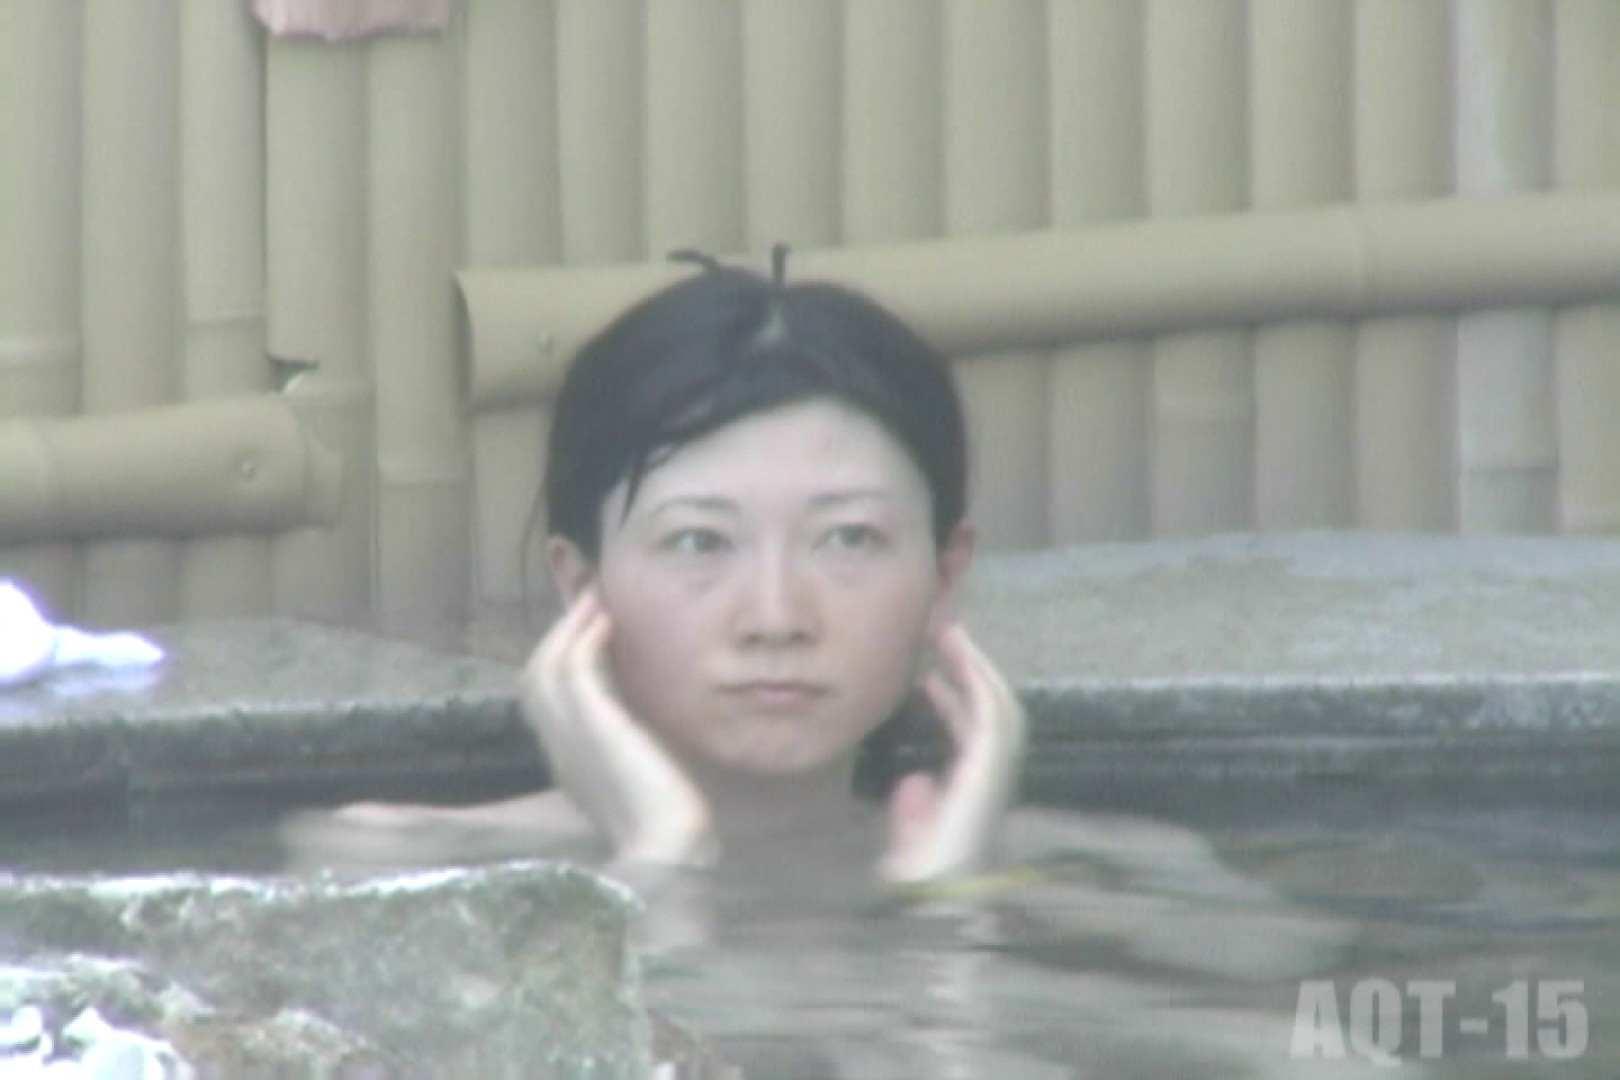 Aquaな露天風呂Vol.835 盗撮 | HなOL  73pic 28